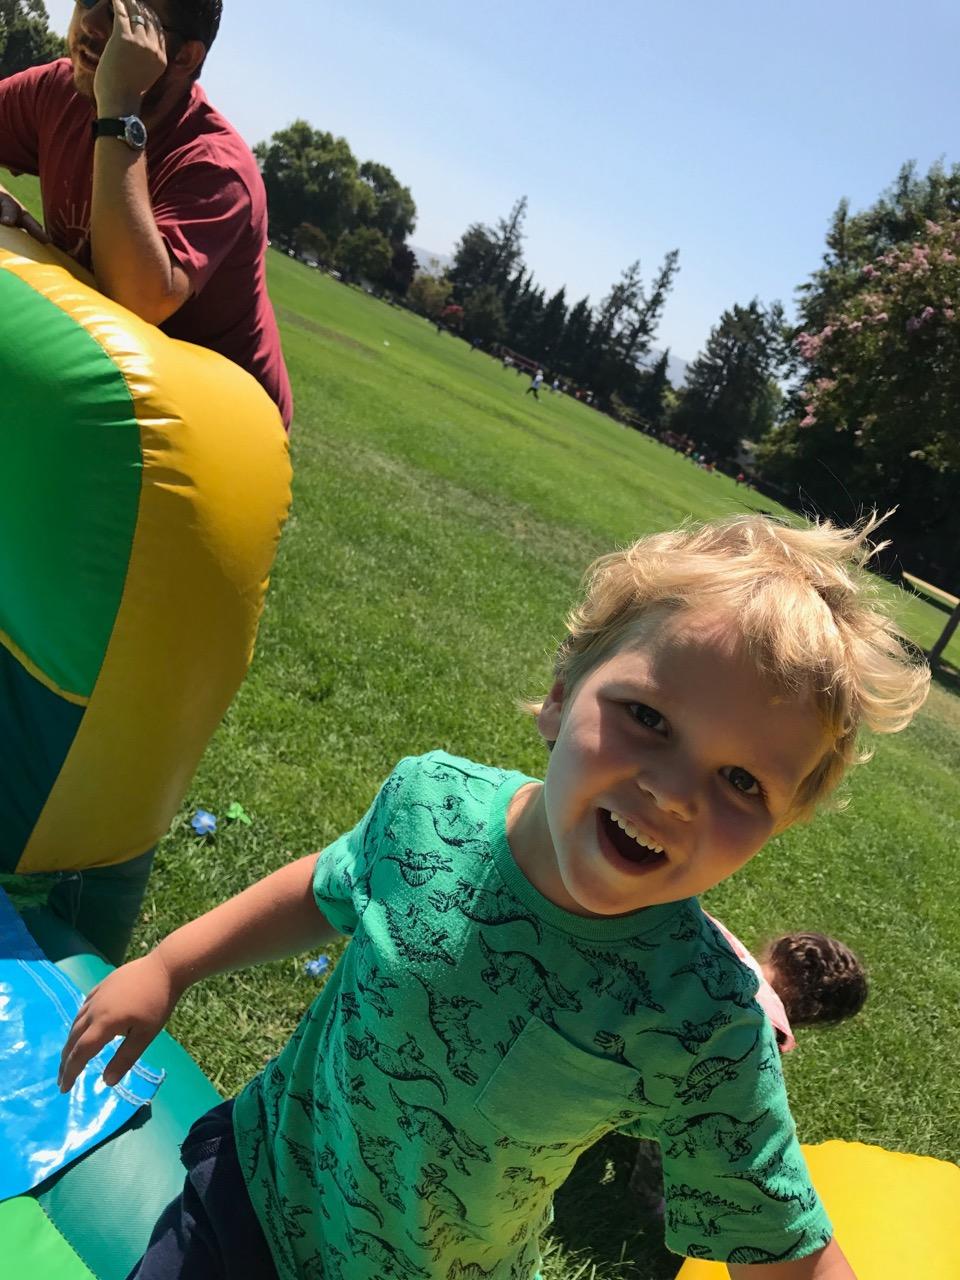 Bounce house fun (August)